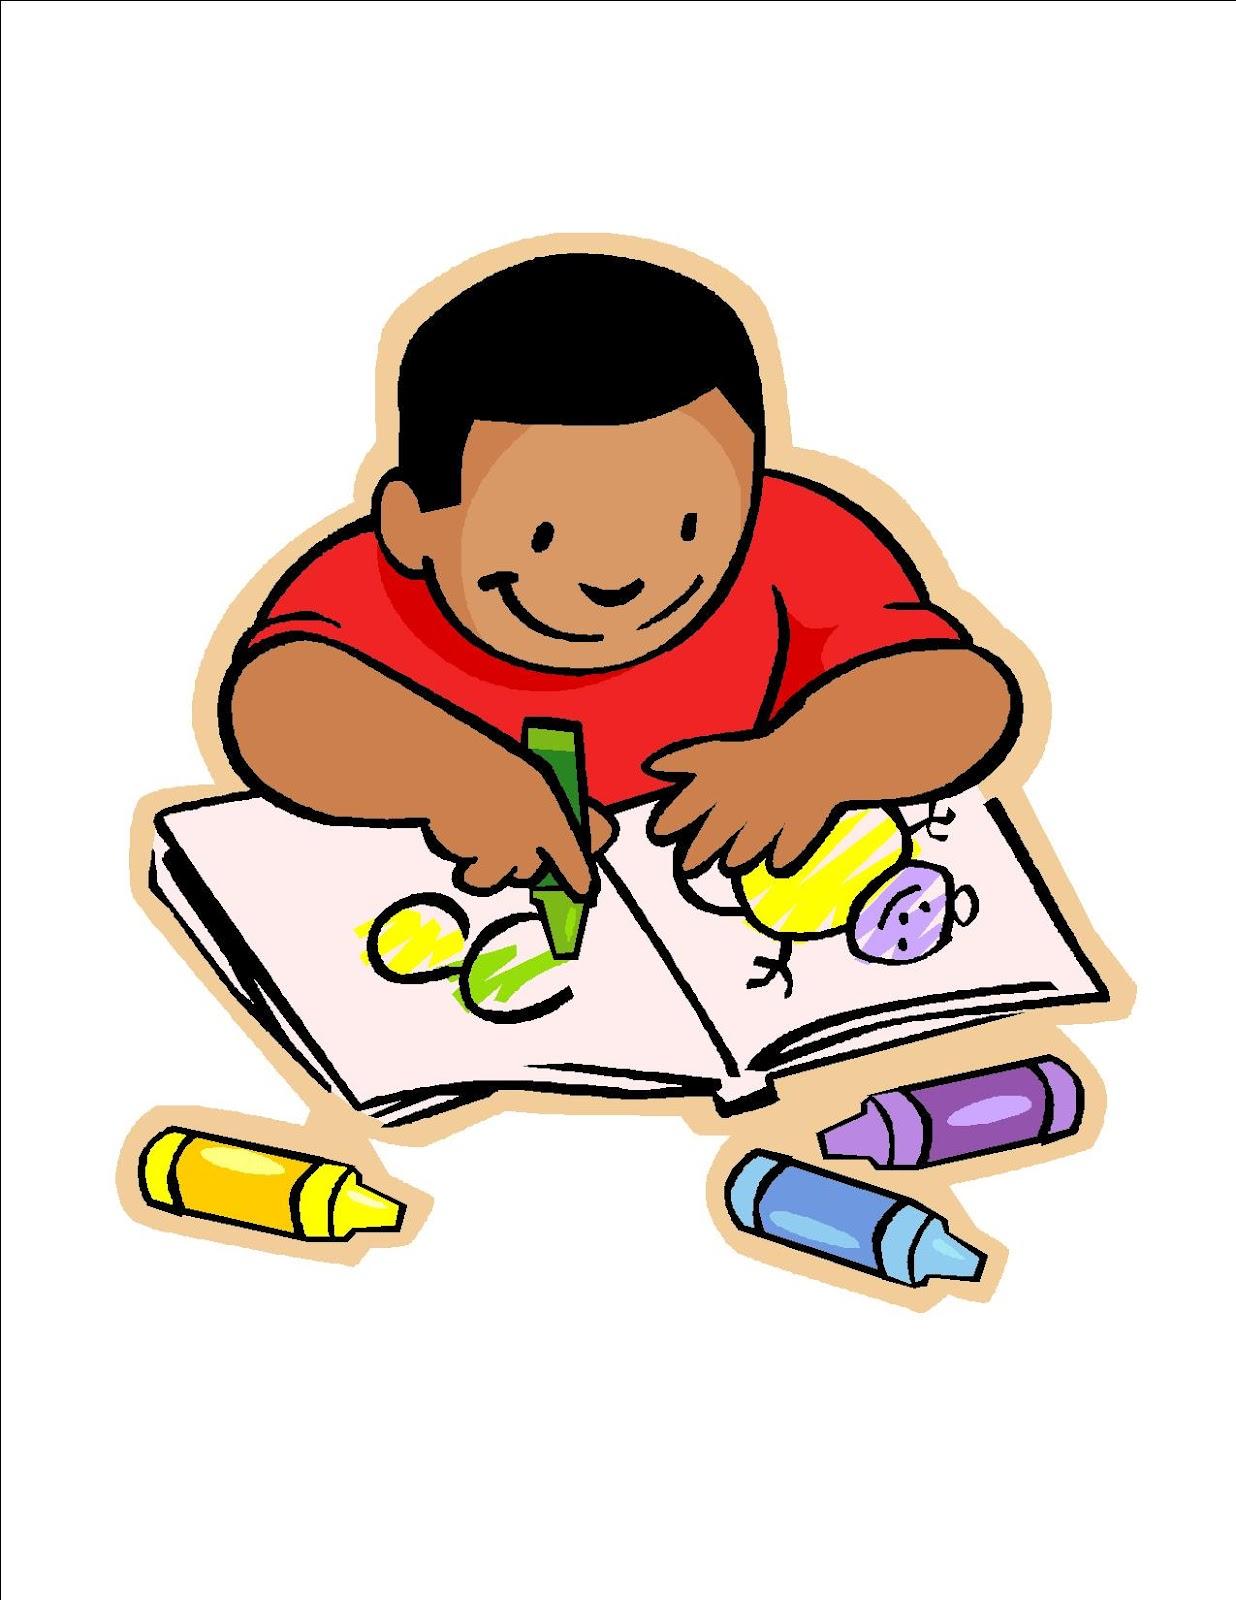 Kids Drawing Clipart: Kids car drawing clipart, Drawing Bath Kids